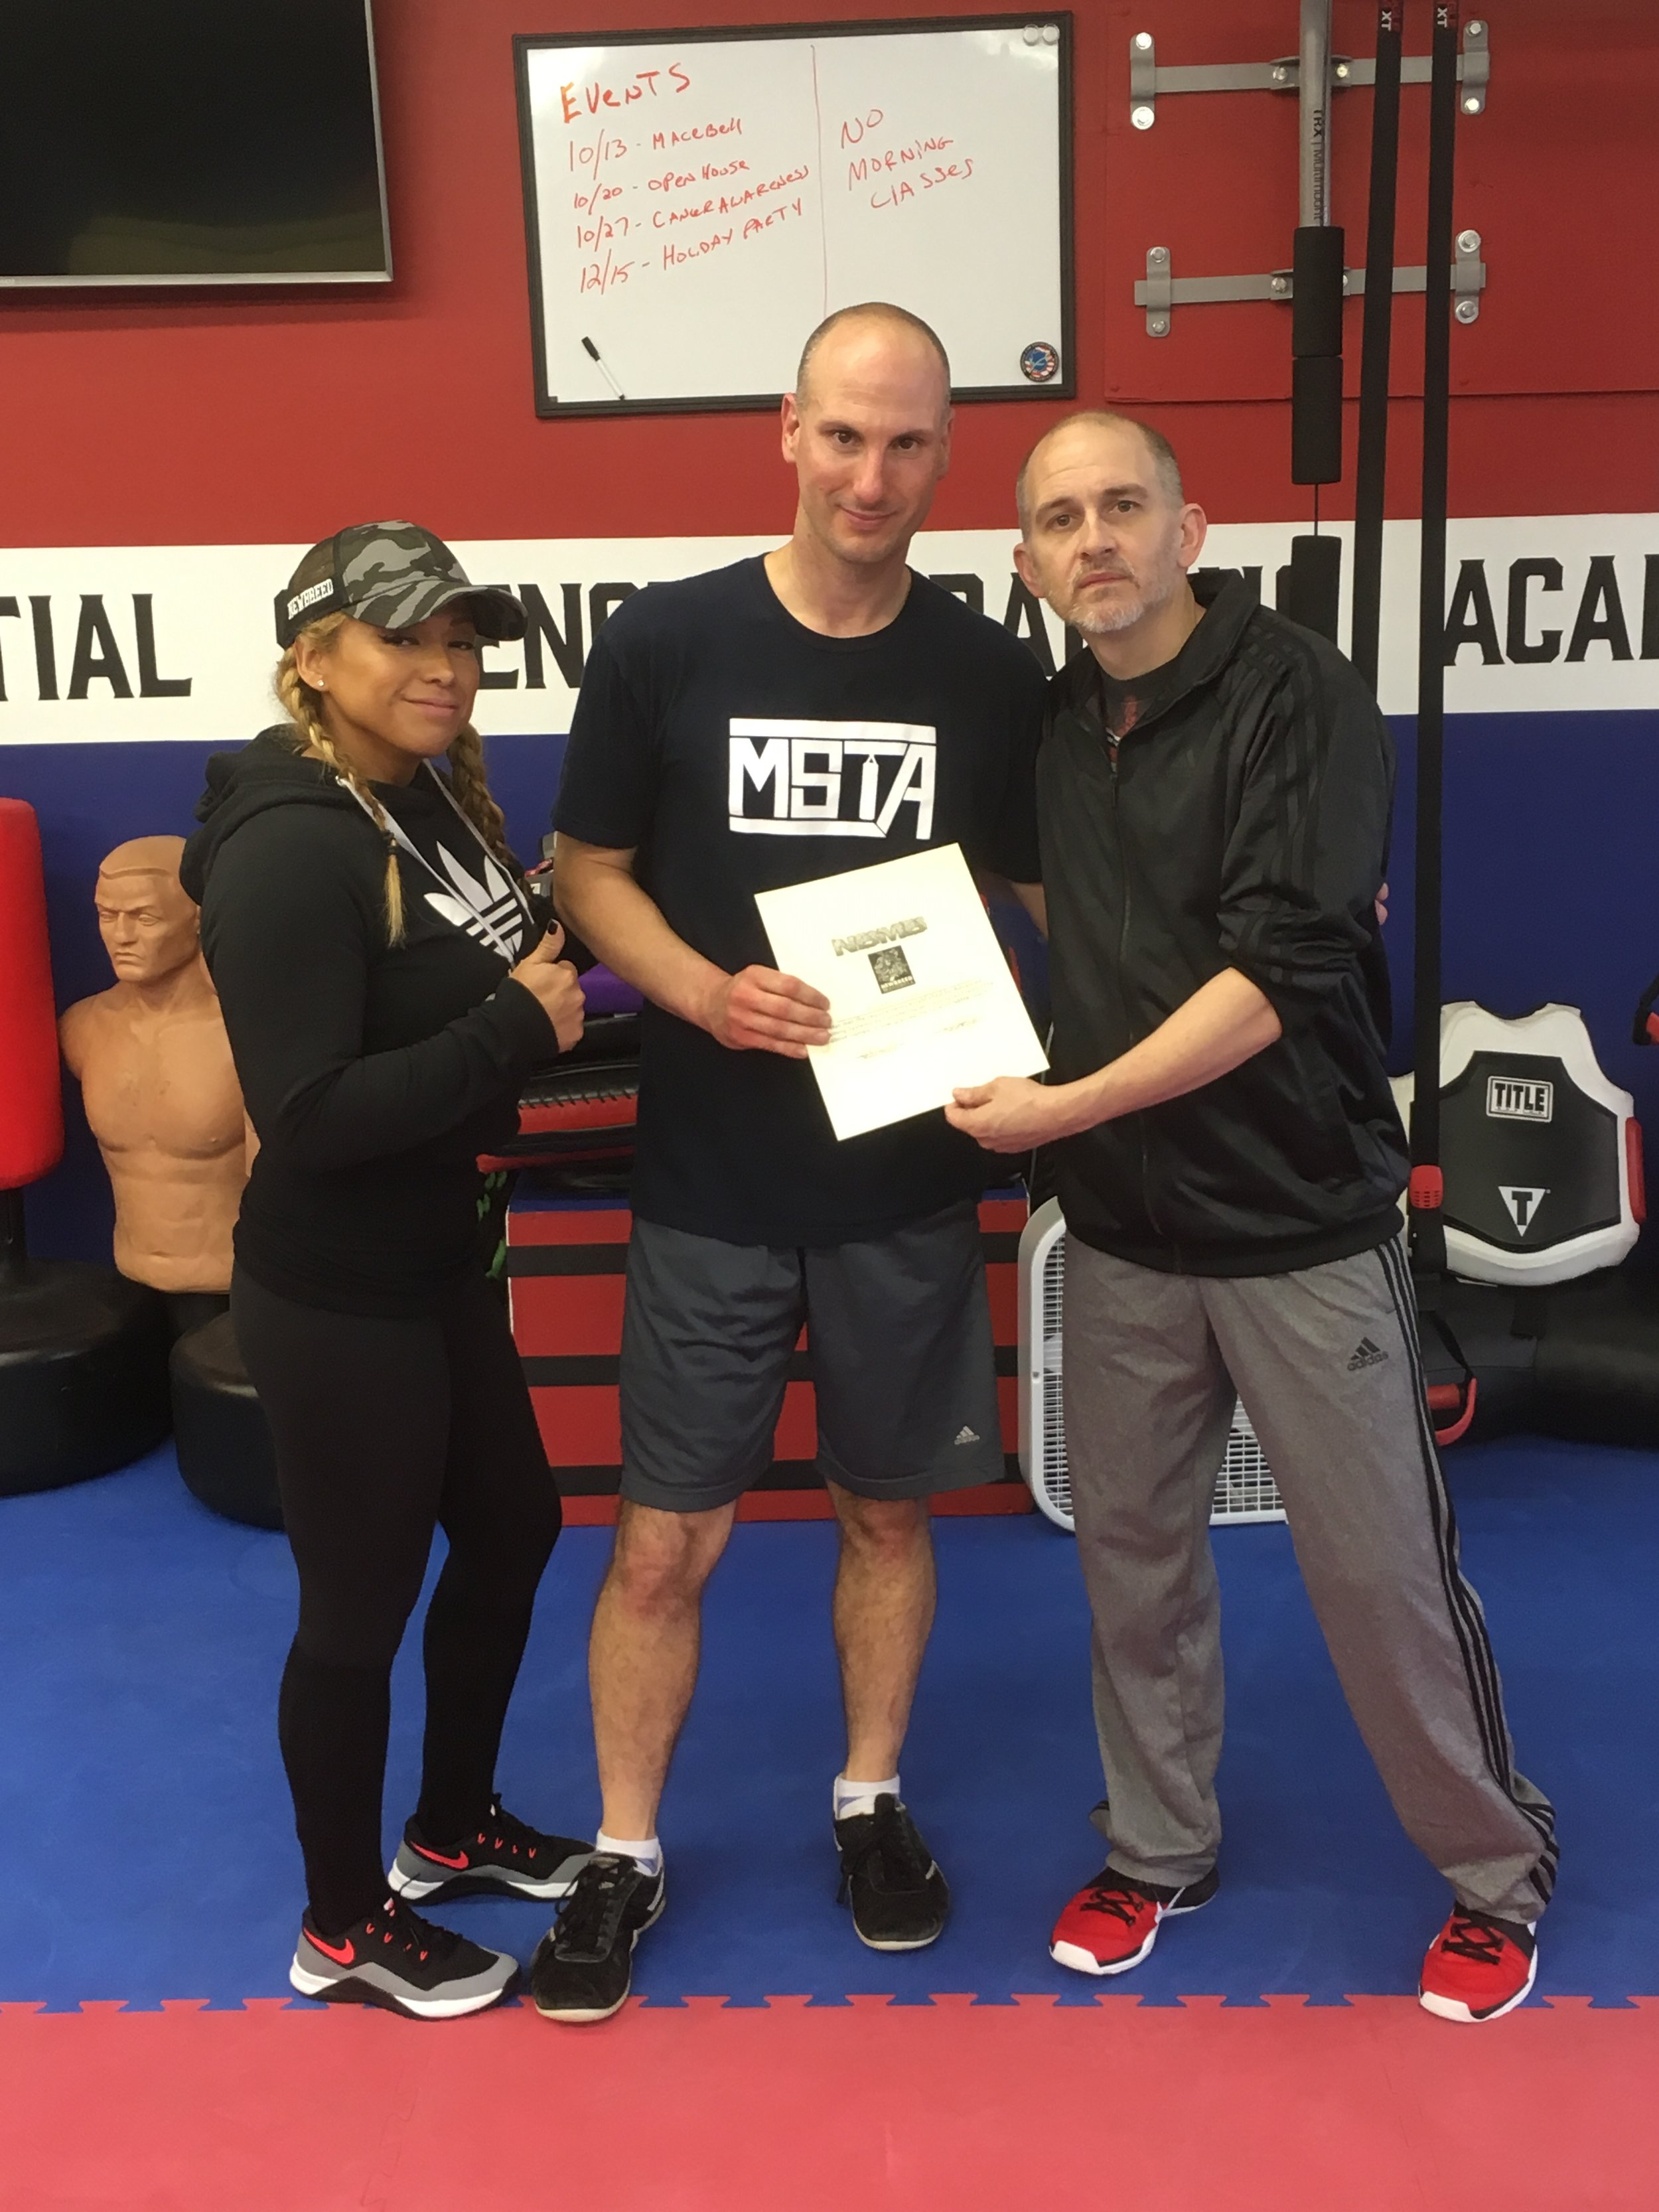 Certified Macebell Coach under Newbreed Fitness